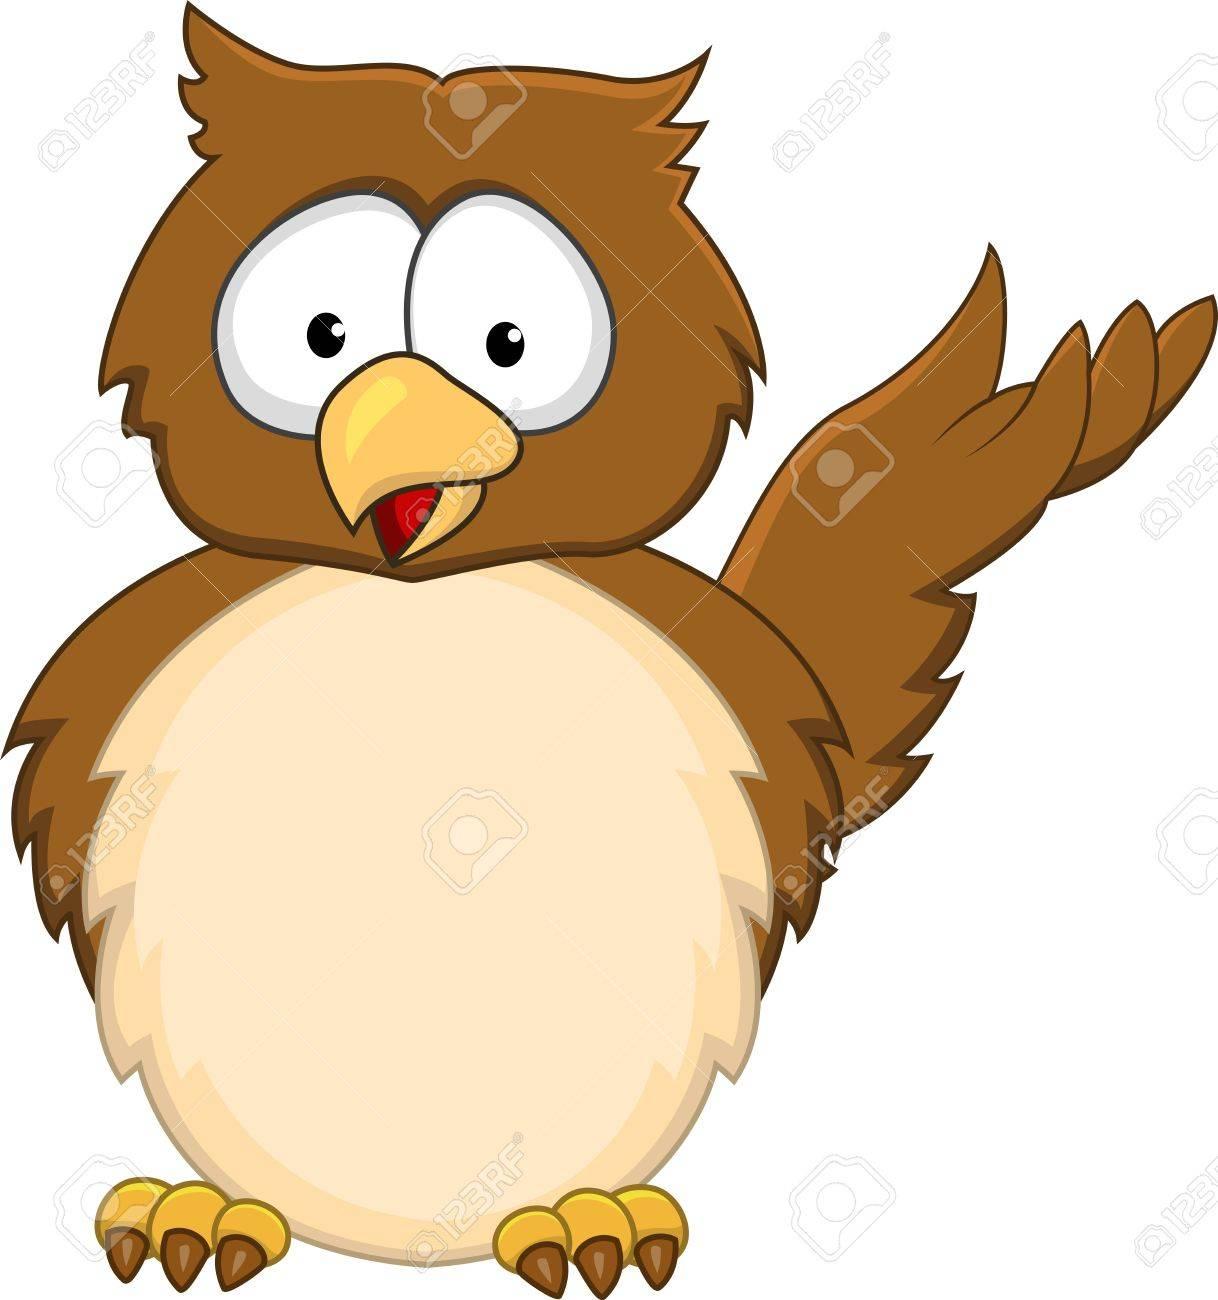 Funny owl cartoon Stock Vector - 13984522